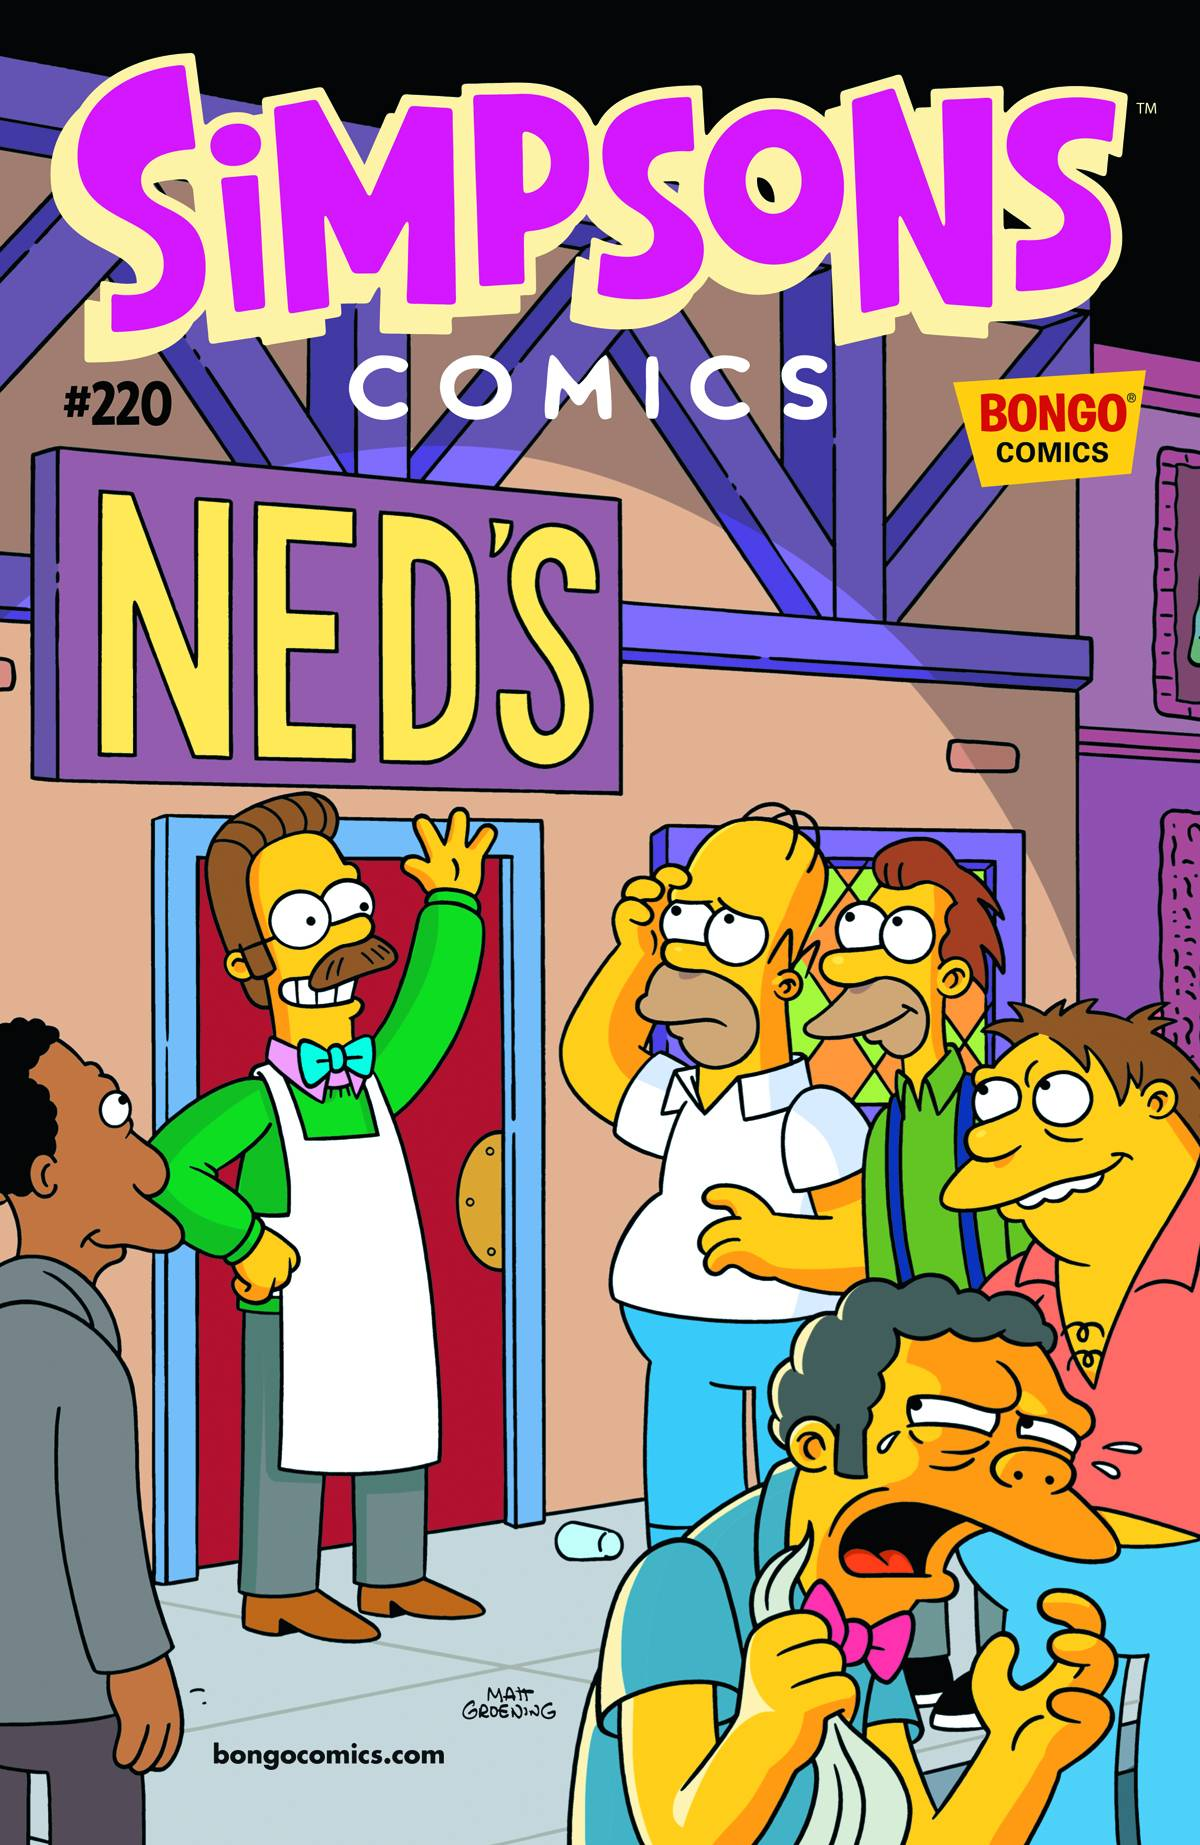 Simpsons Comics 220.jpg